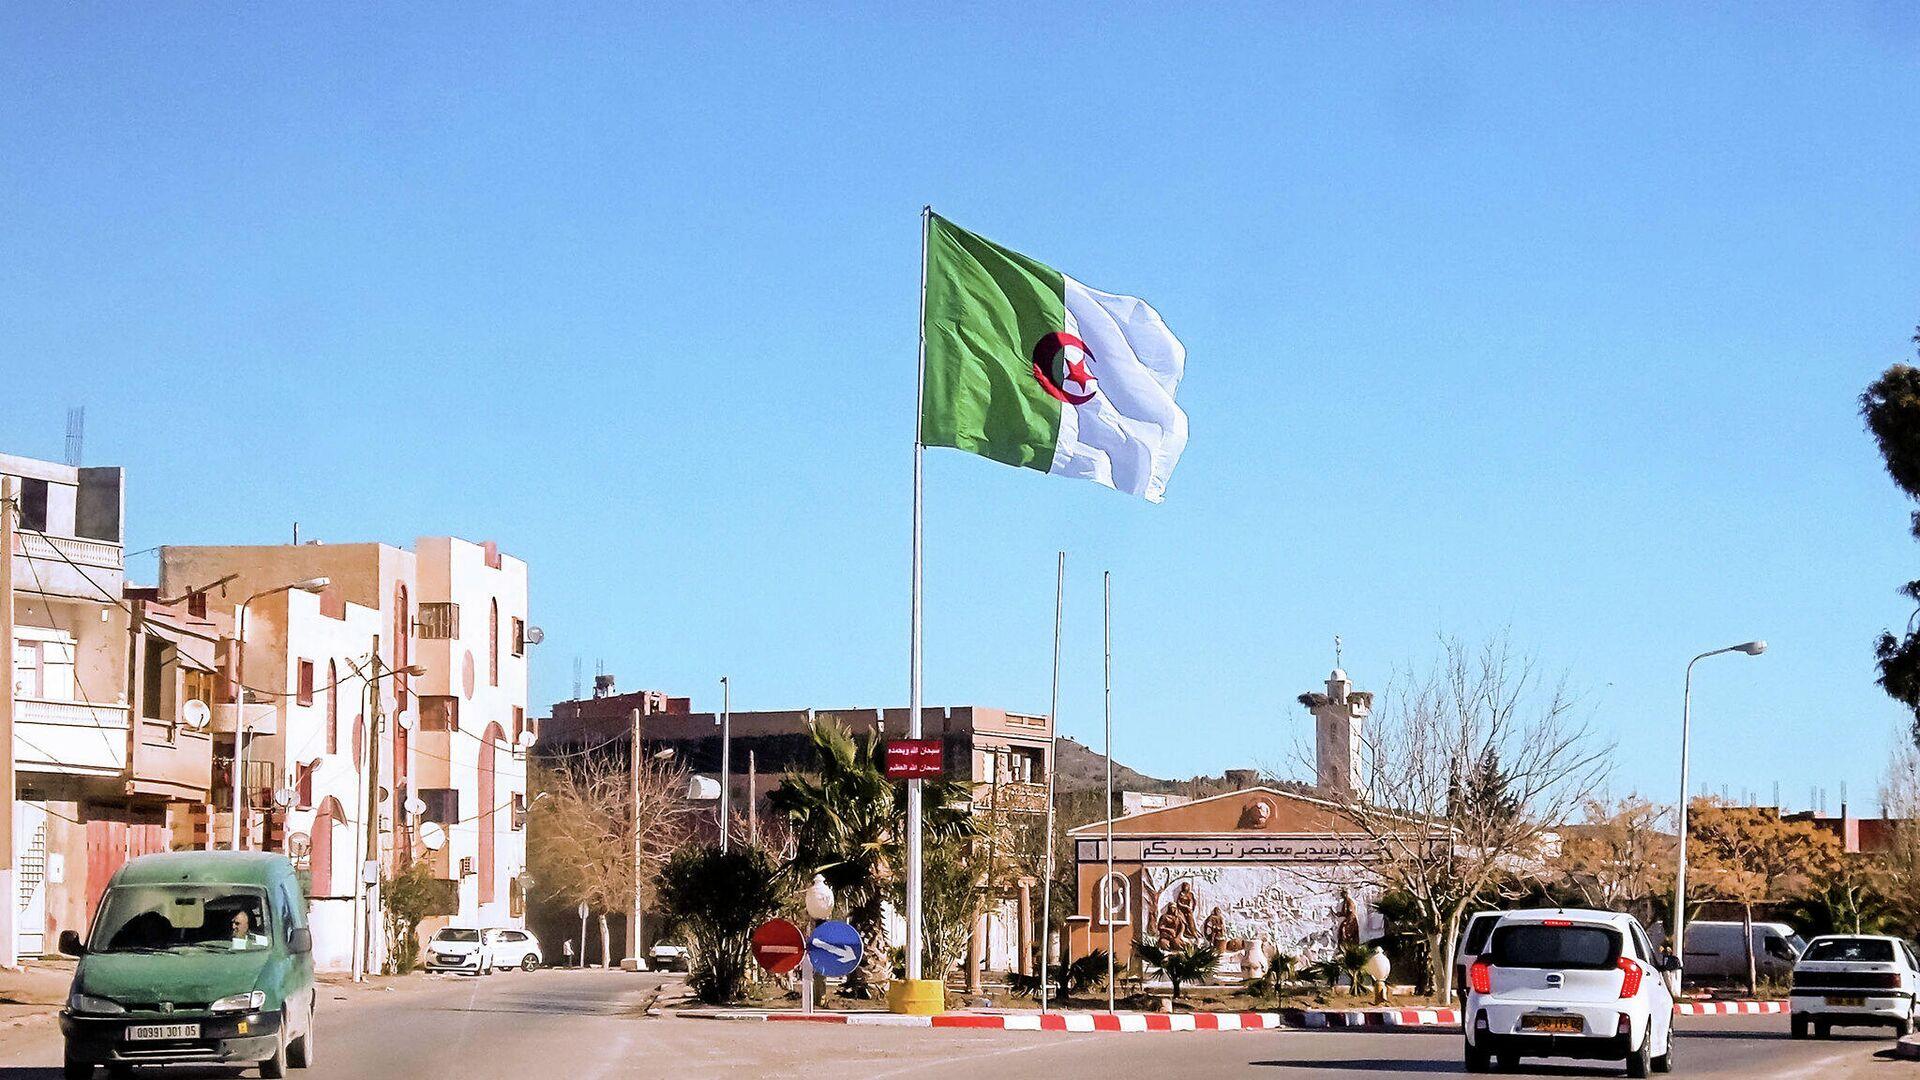 The Algerian flag flies in the commune of Ouyoune El Assafir, Batna Province - Sputnik International, 1920, 13.10.2021